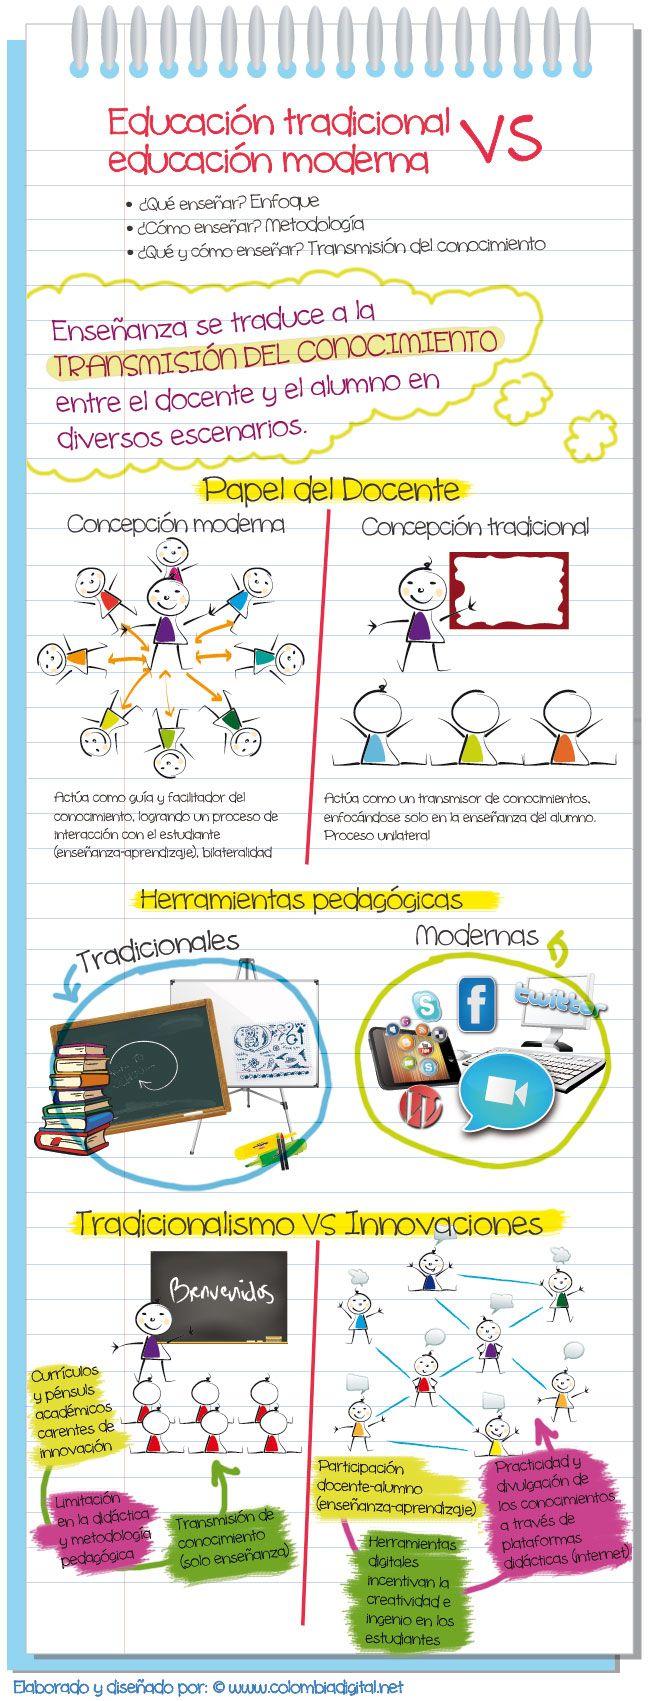 Diferencias entre educacion tradicional y educacion moderna #infografia #infografiaenespañol